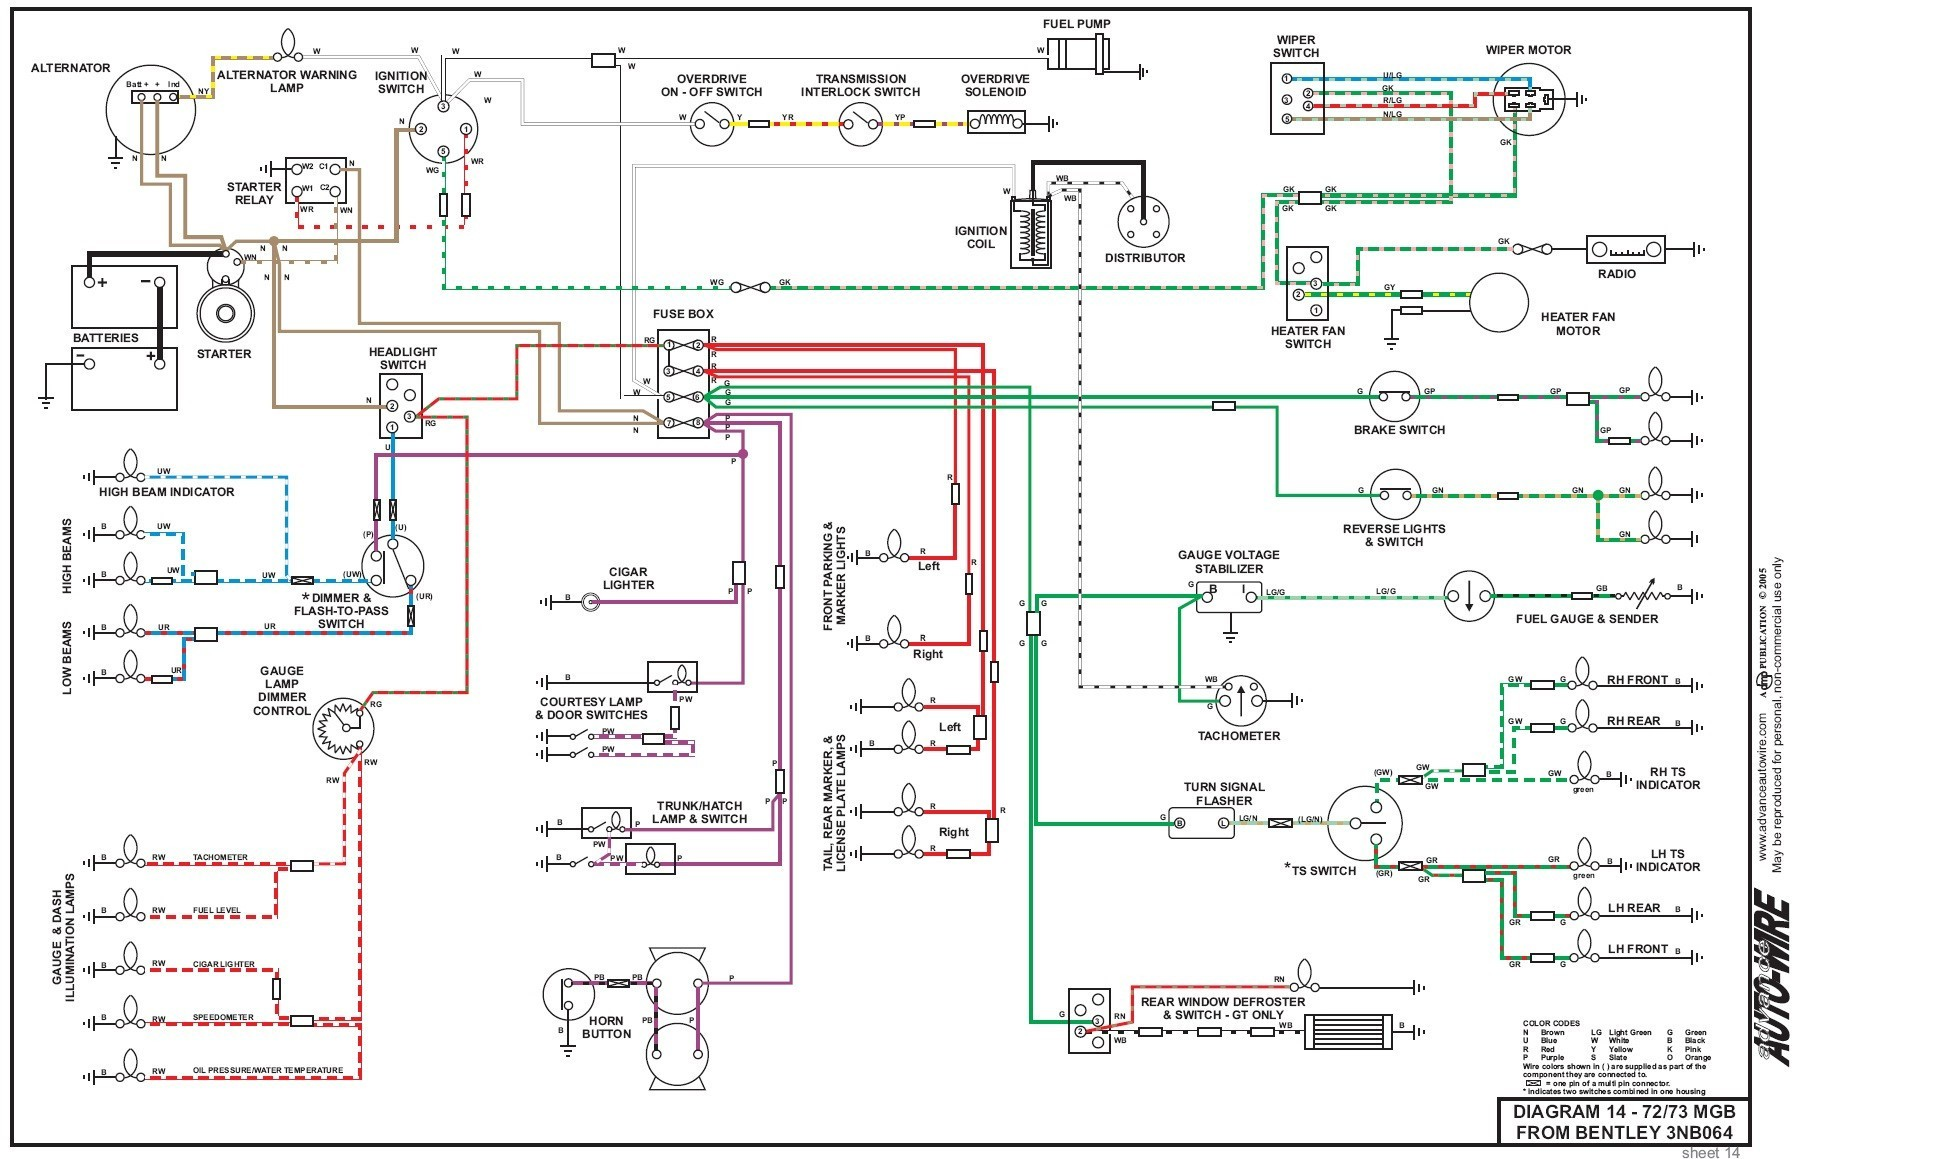 Bad Boy Horn Wiring Diagram Diagram Sinusutist Wiring Diagram General Of Bad Boy Horn Wiring Diagram